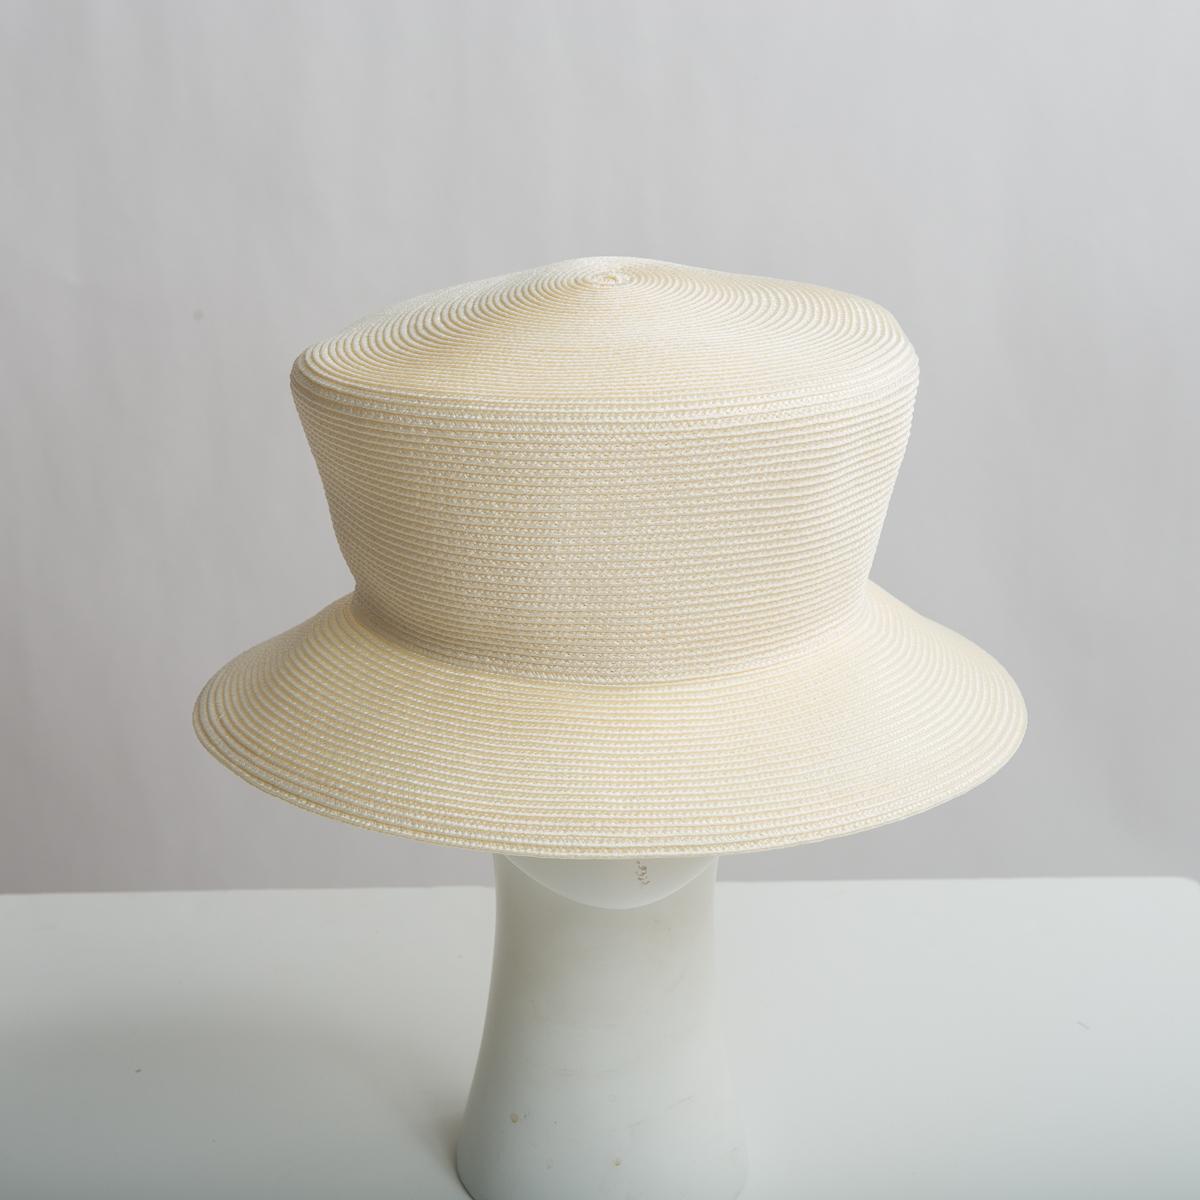 9700d6fbb939e0 Ivory Dull Polypropylene Straw Medium Brim Plain Hats-Y6030_88-23- Sun  Yorkos | Zoria